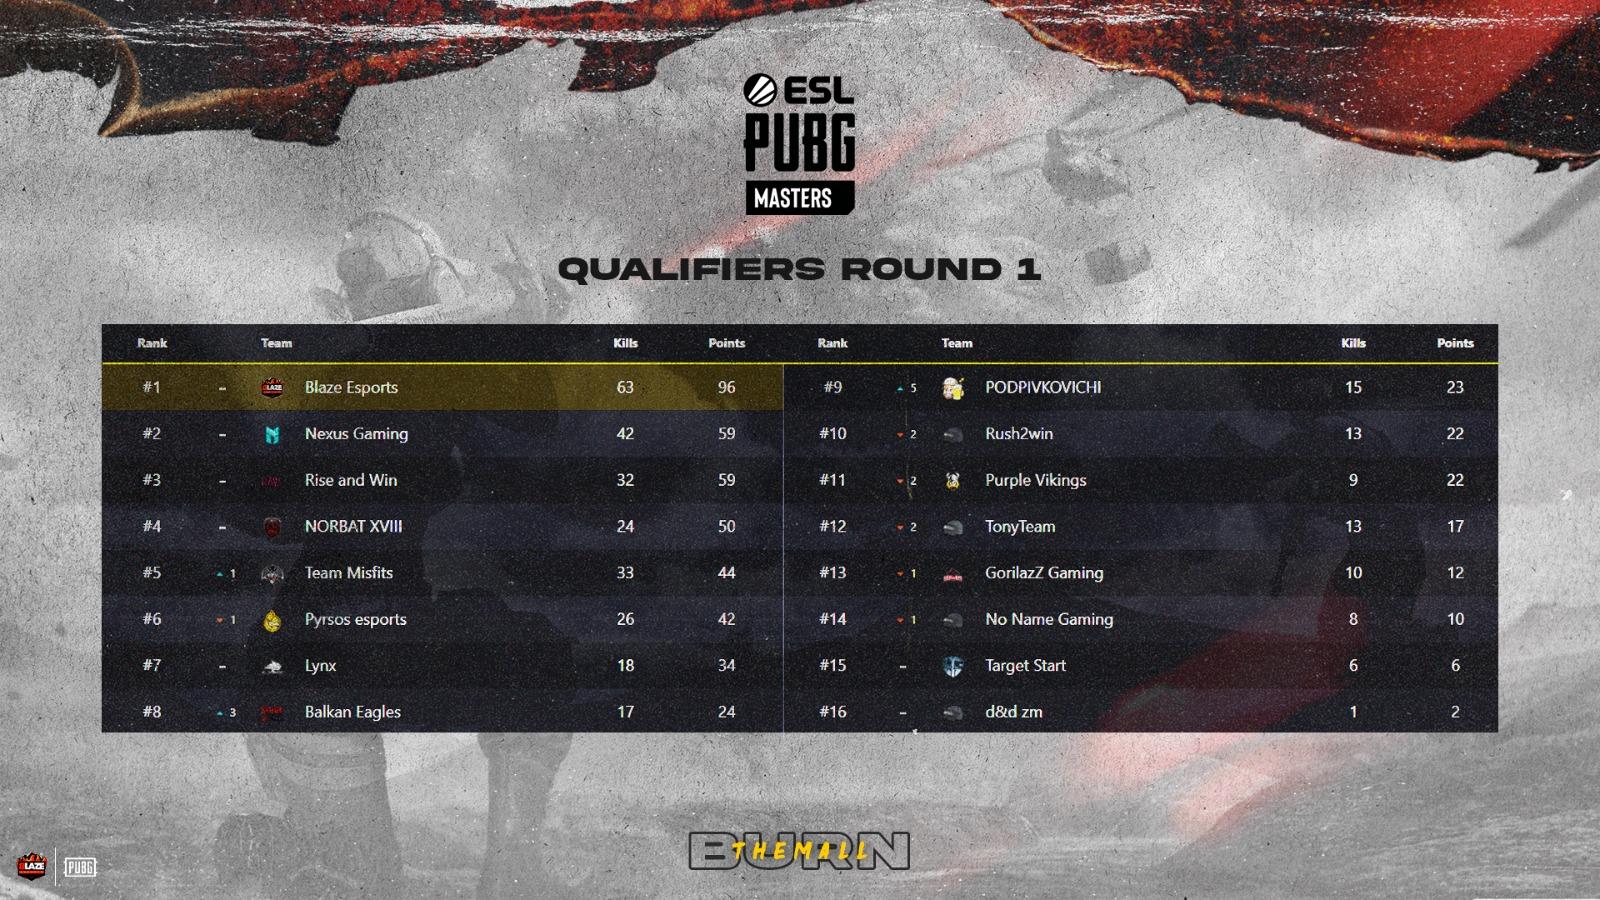 PUBG Masters Qualifiers Spring